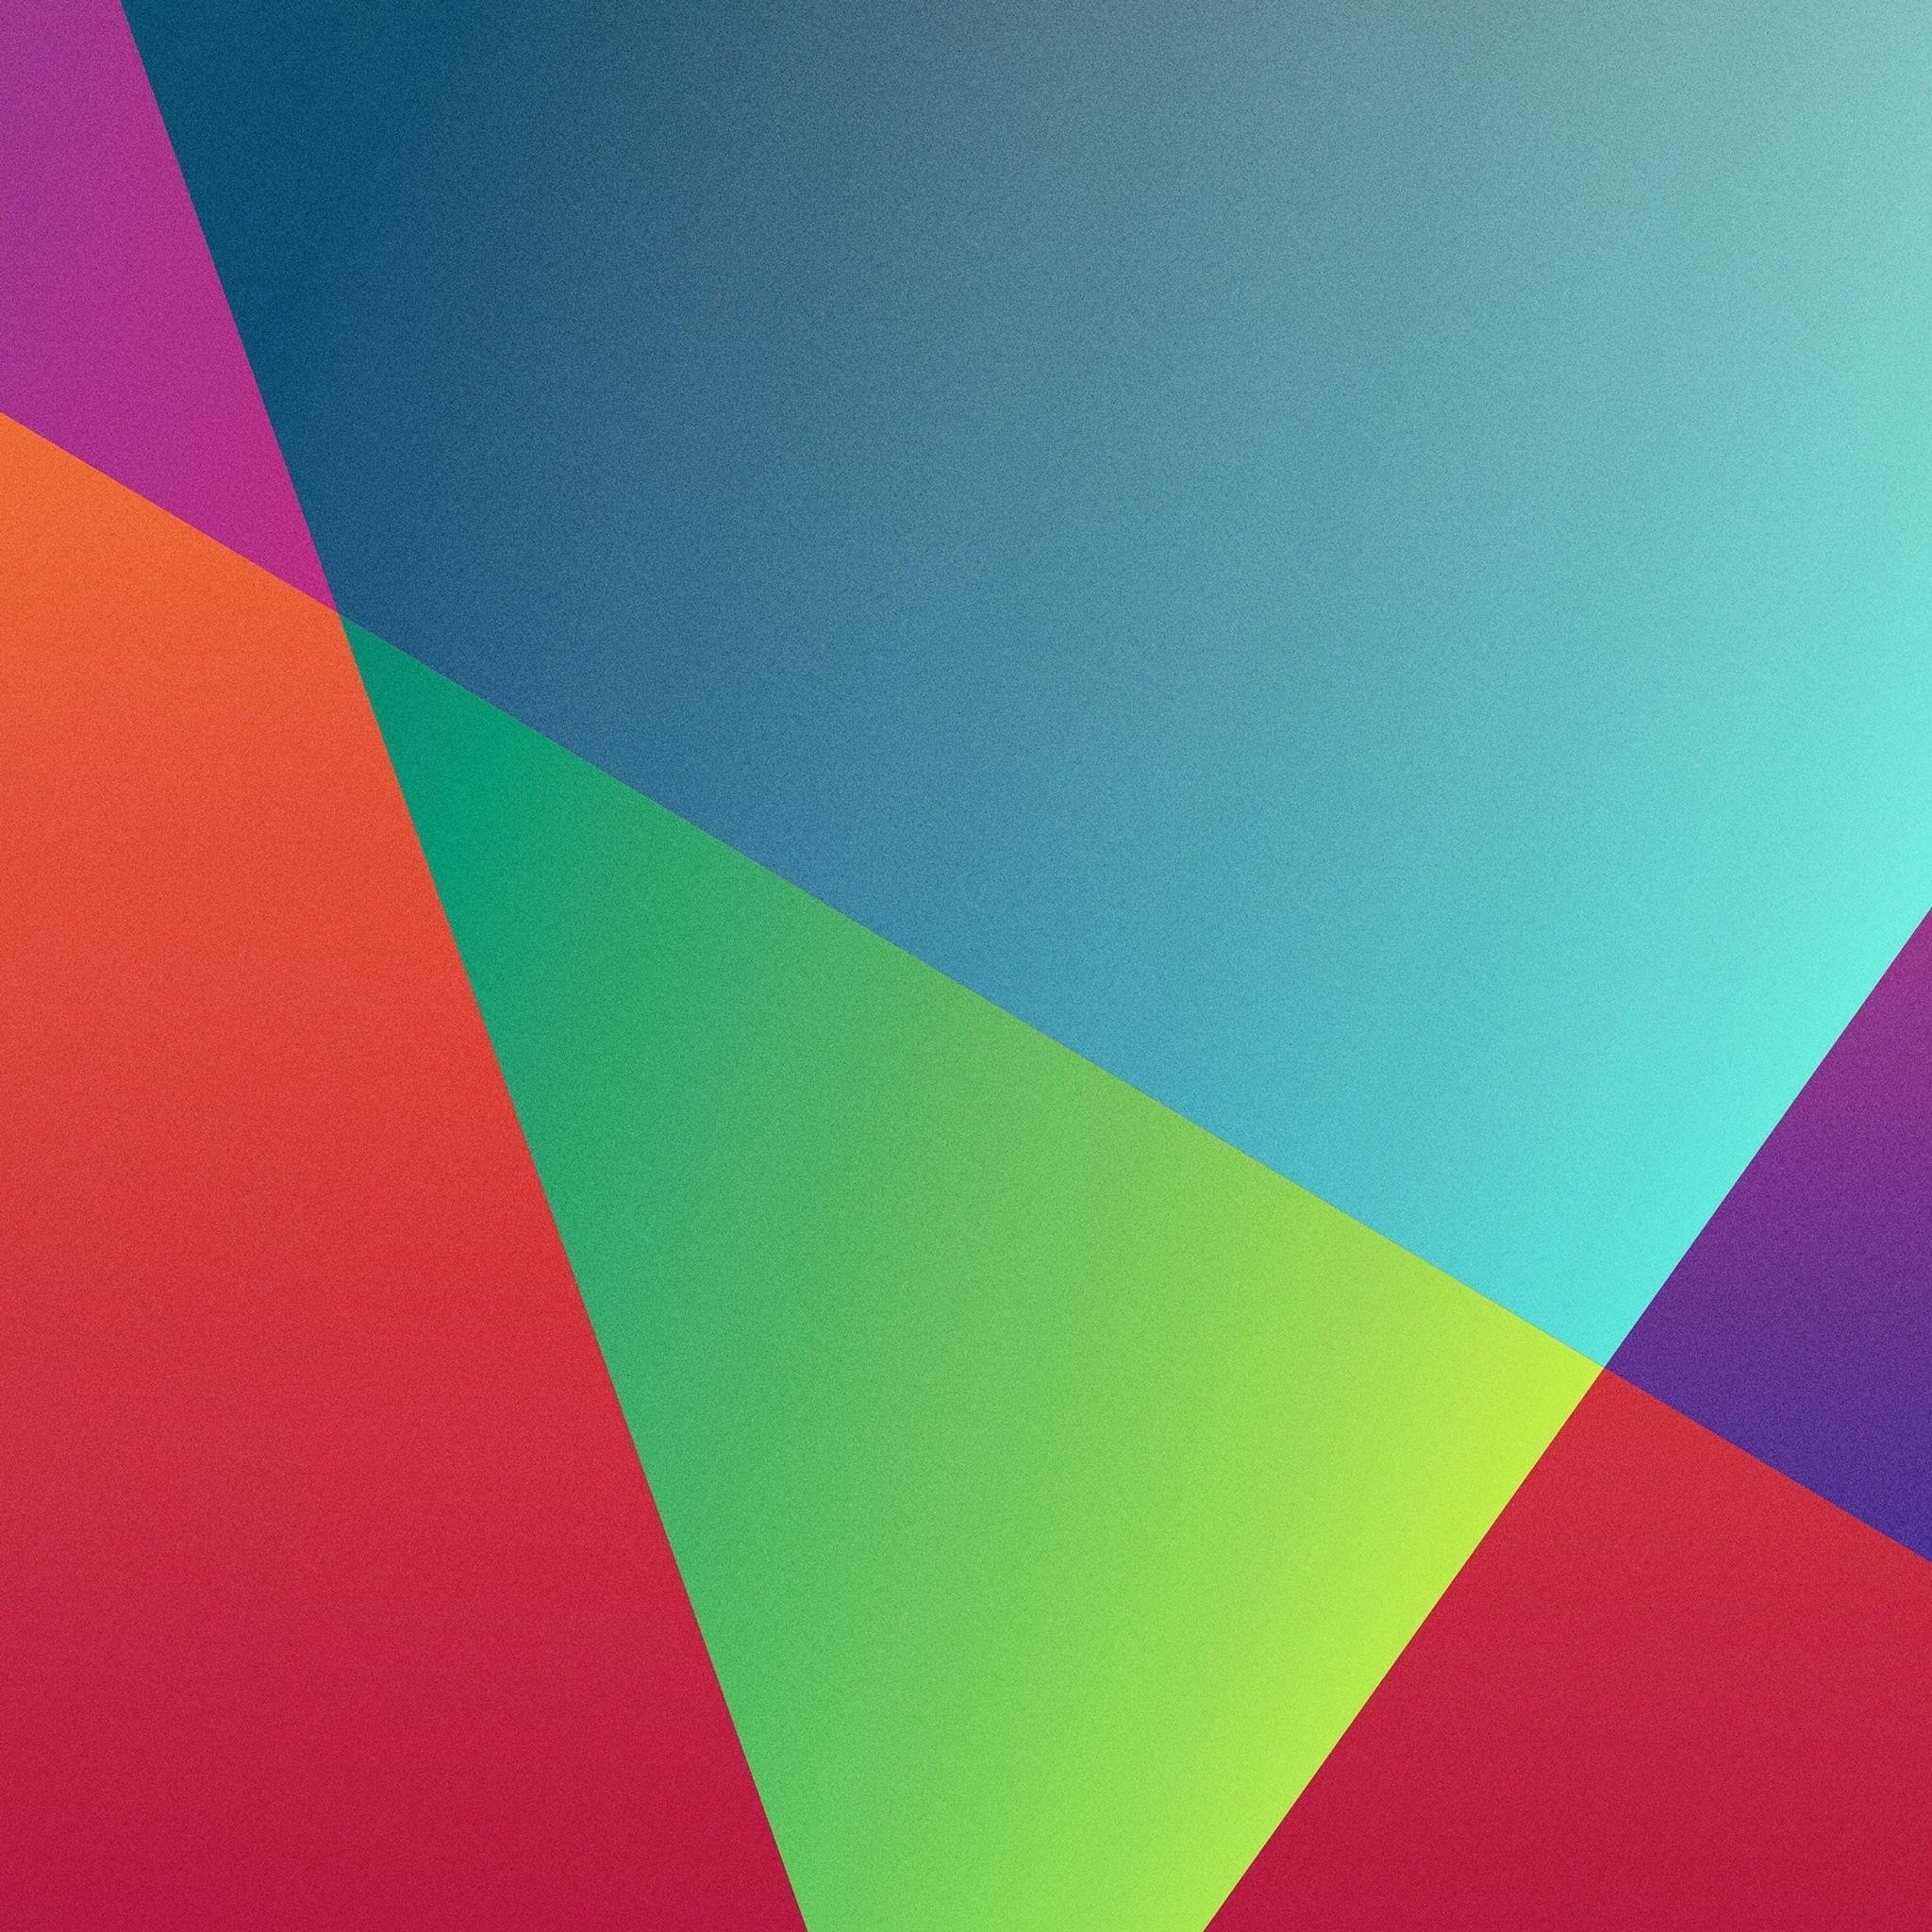 iOS7 Style iPad Wallpaper HD IPad Retina Wallpapers Ipad Air Wallpaper 2048x2048